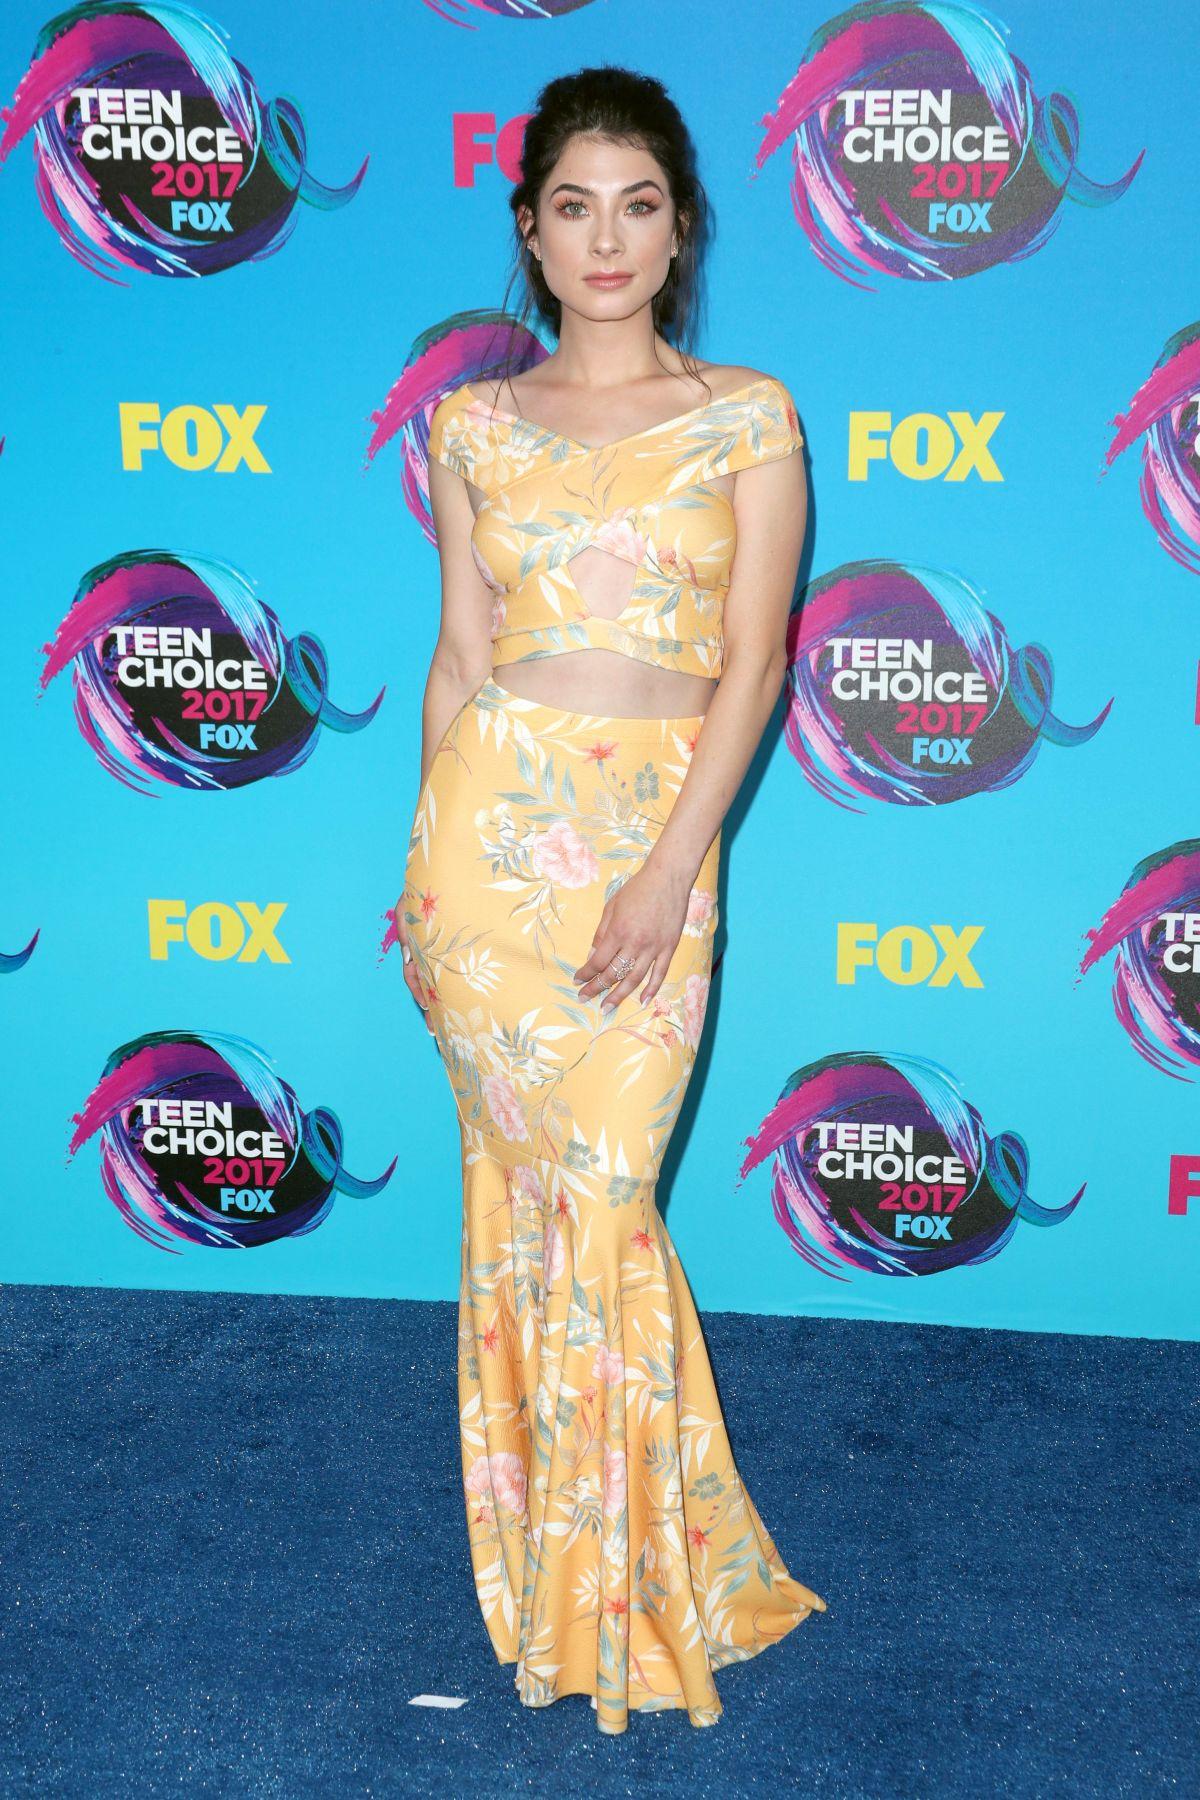 NIKKI KOSS at Teen Choice Awards 2017 in Los Angeles 08/13/2017